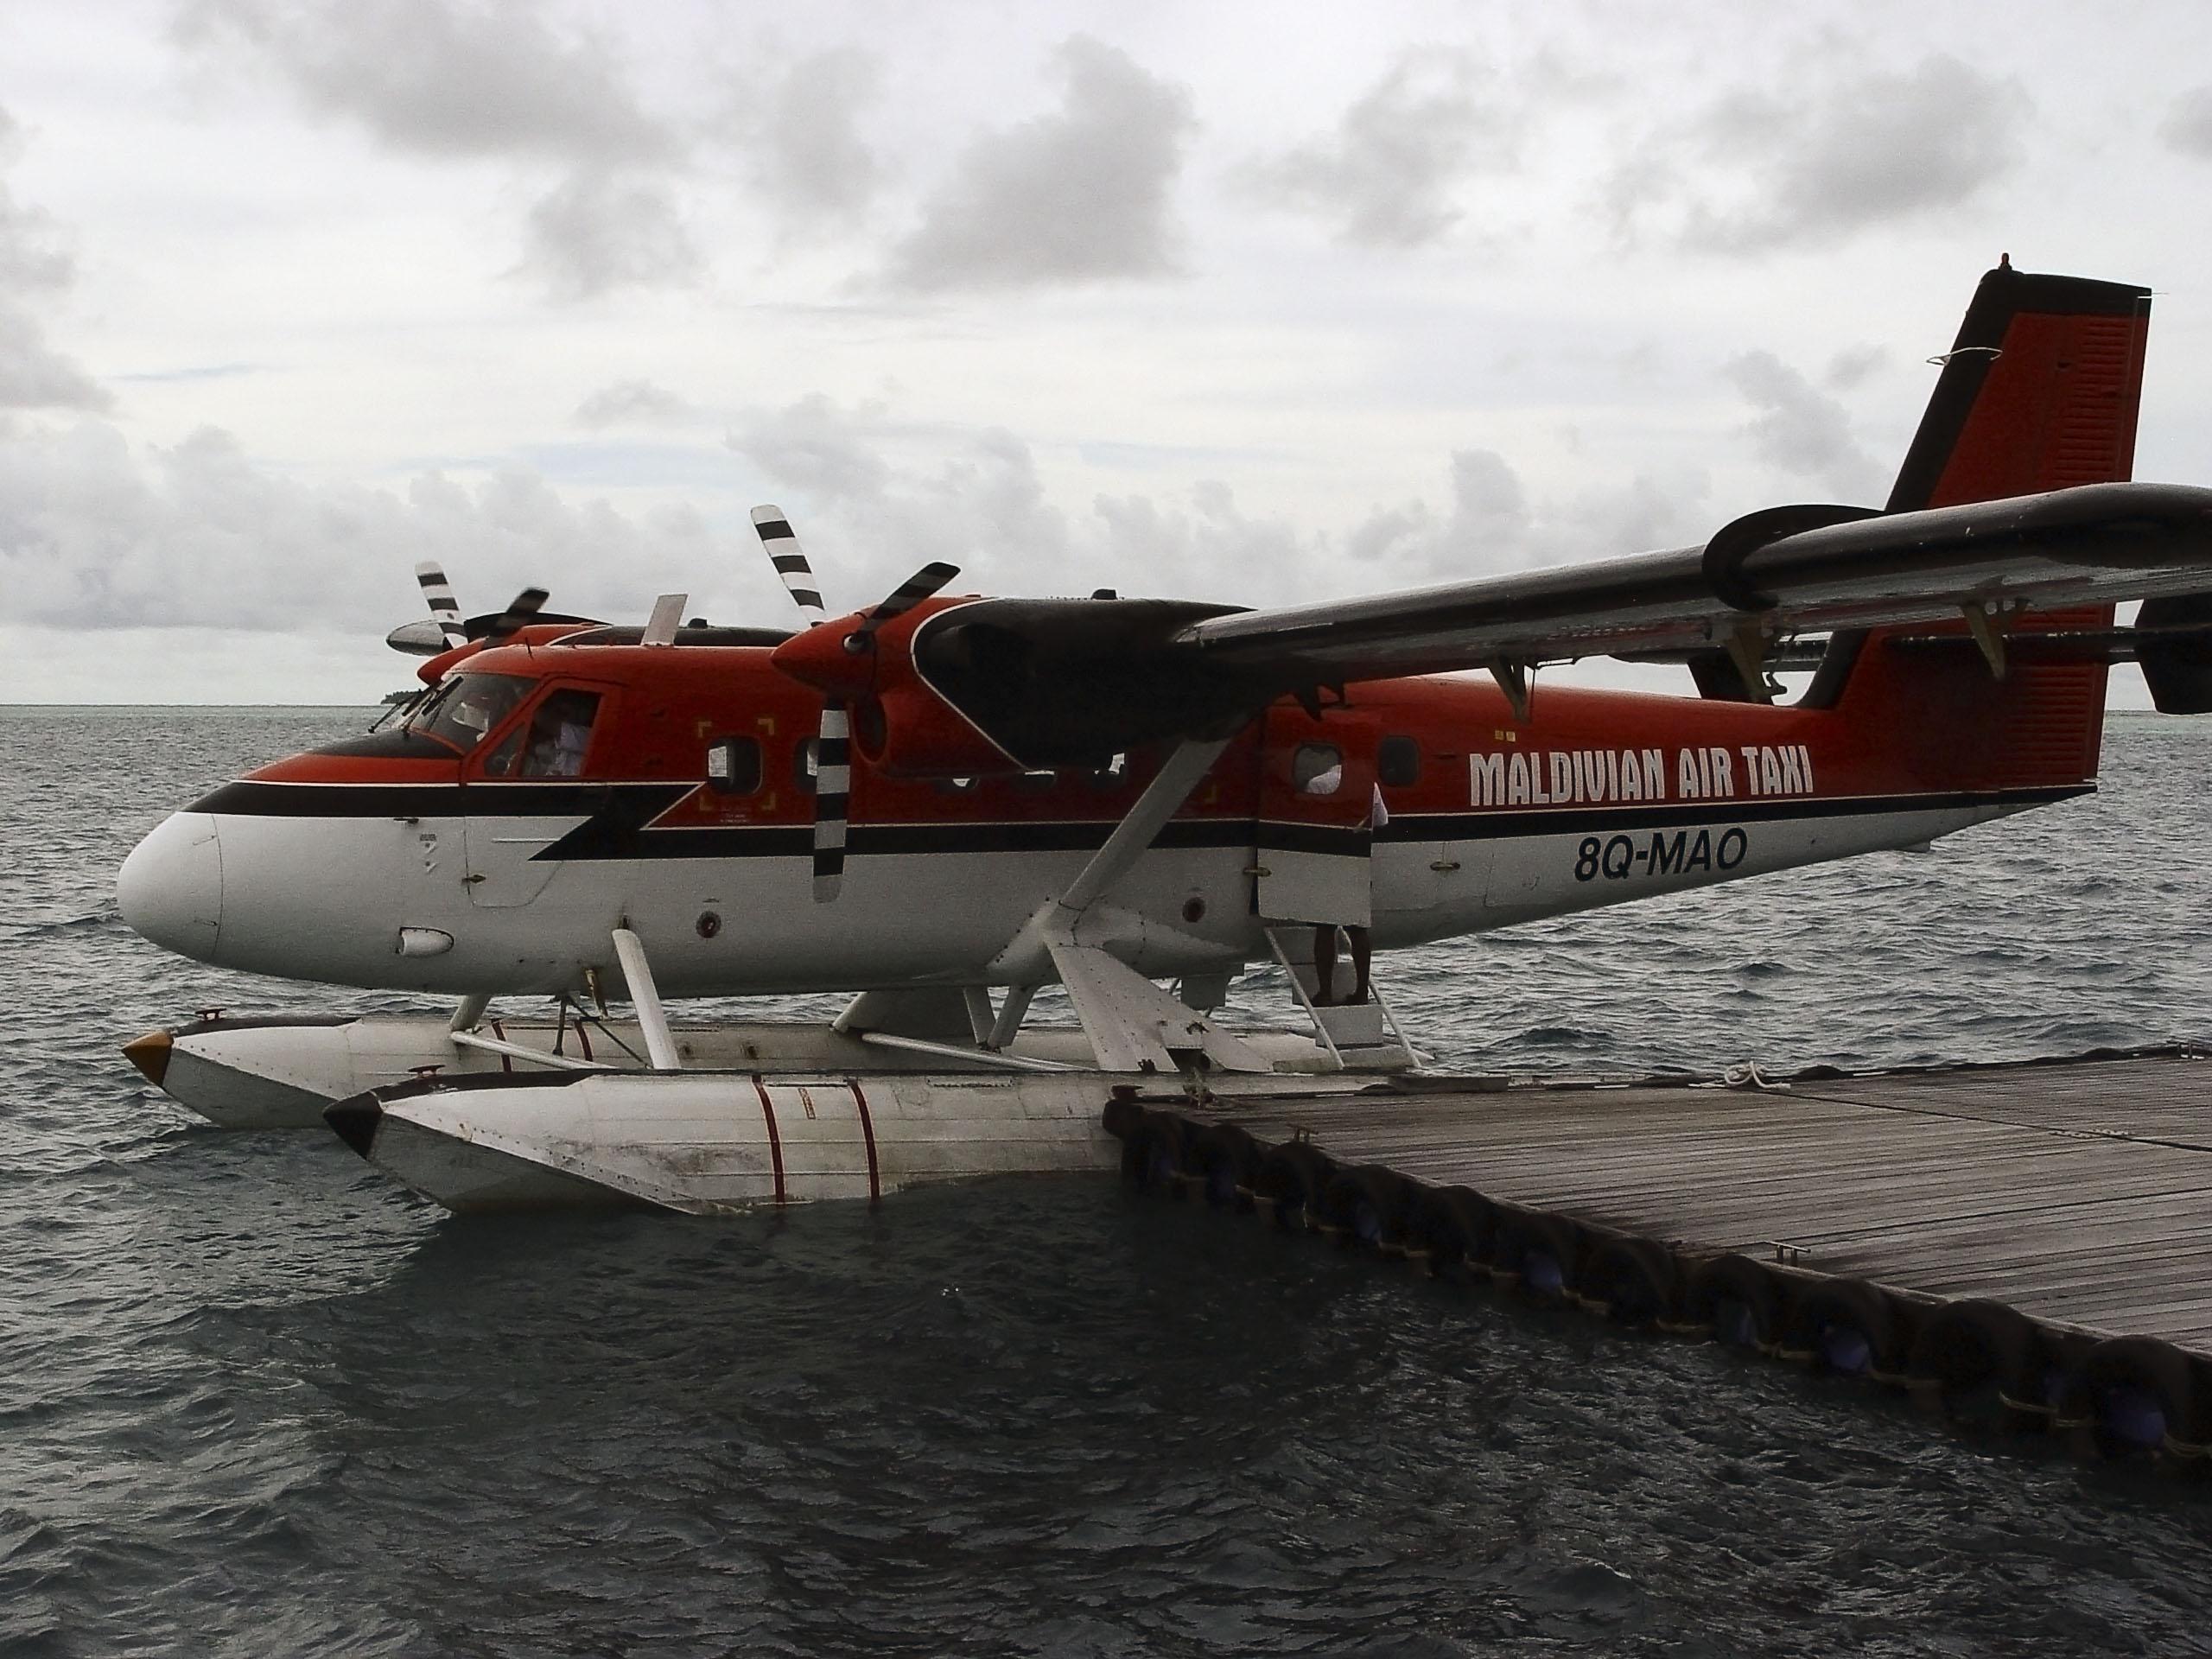 Maldivian Air Taxi Wikipedia